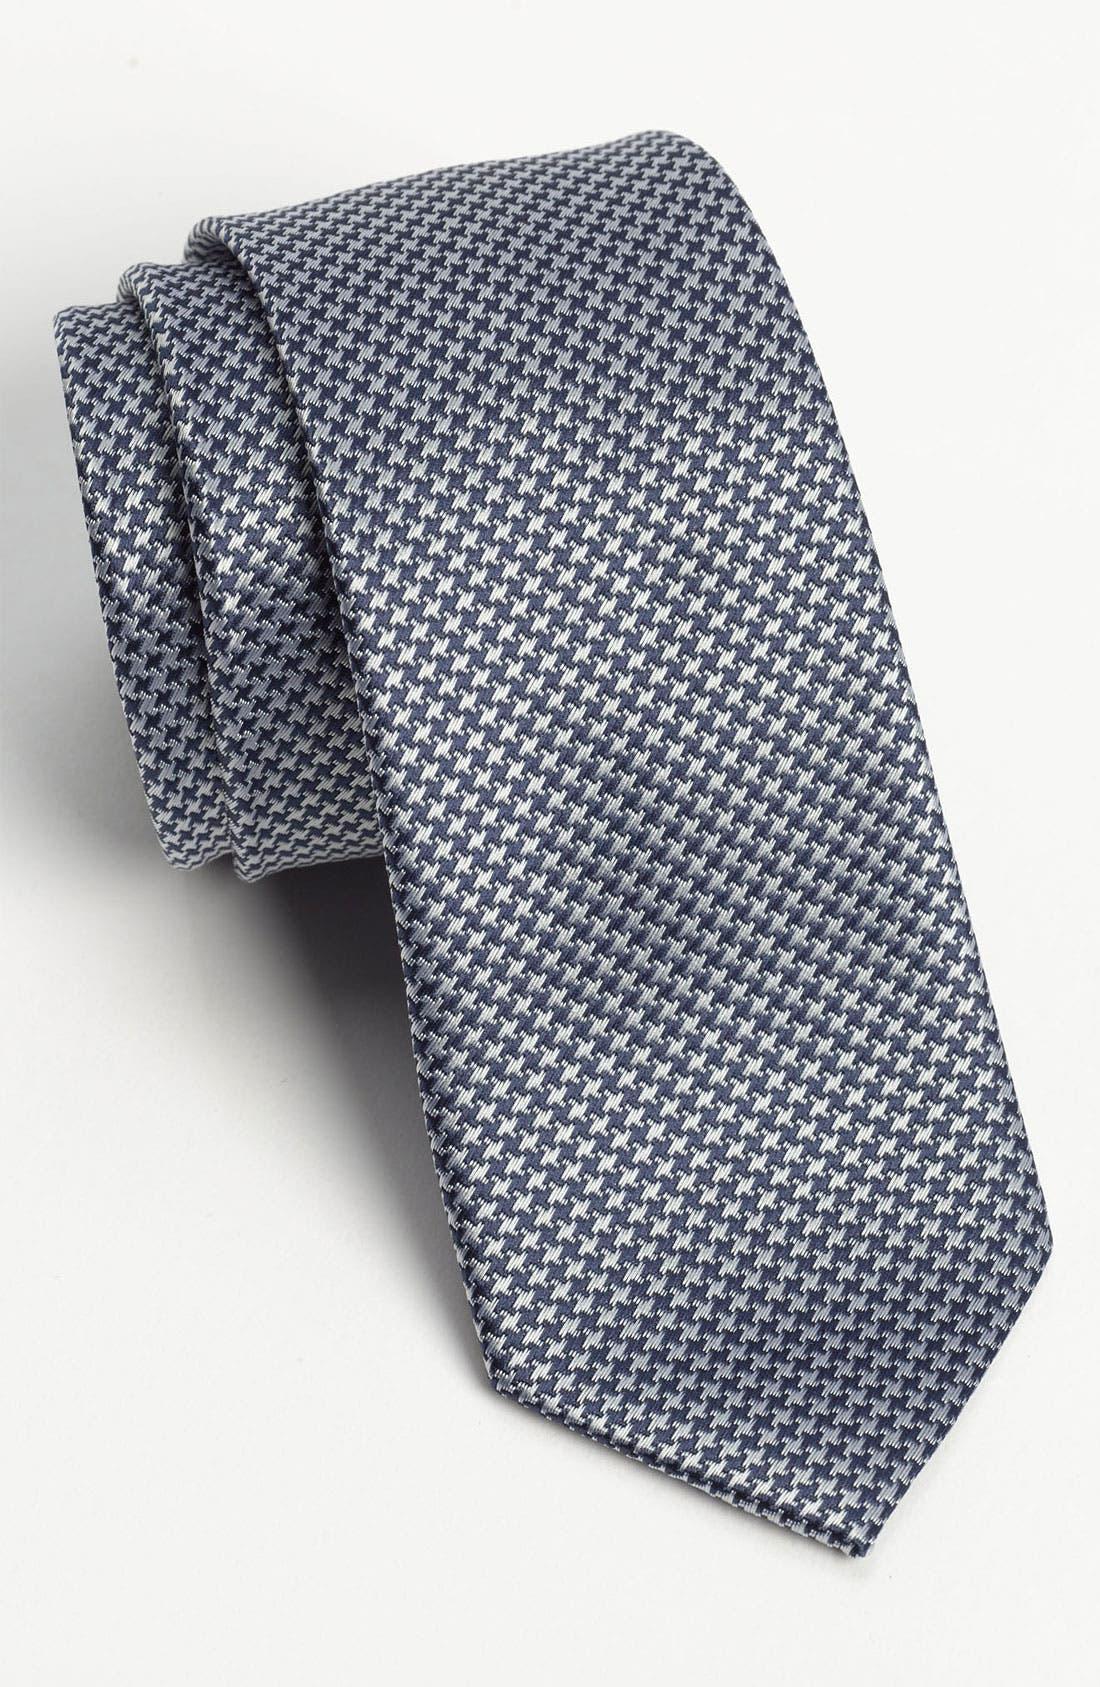 Alternate Image 1 Selected - Topman Houndstooth Woven Tie